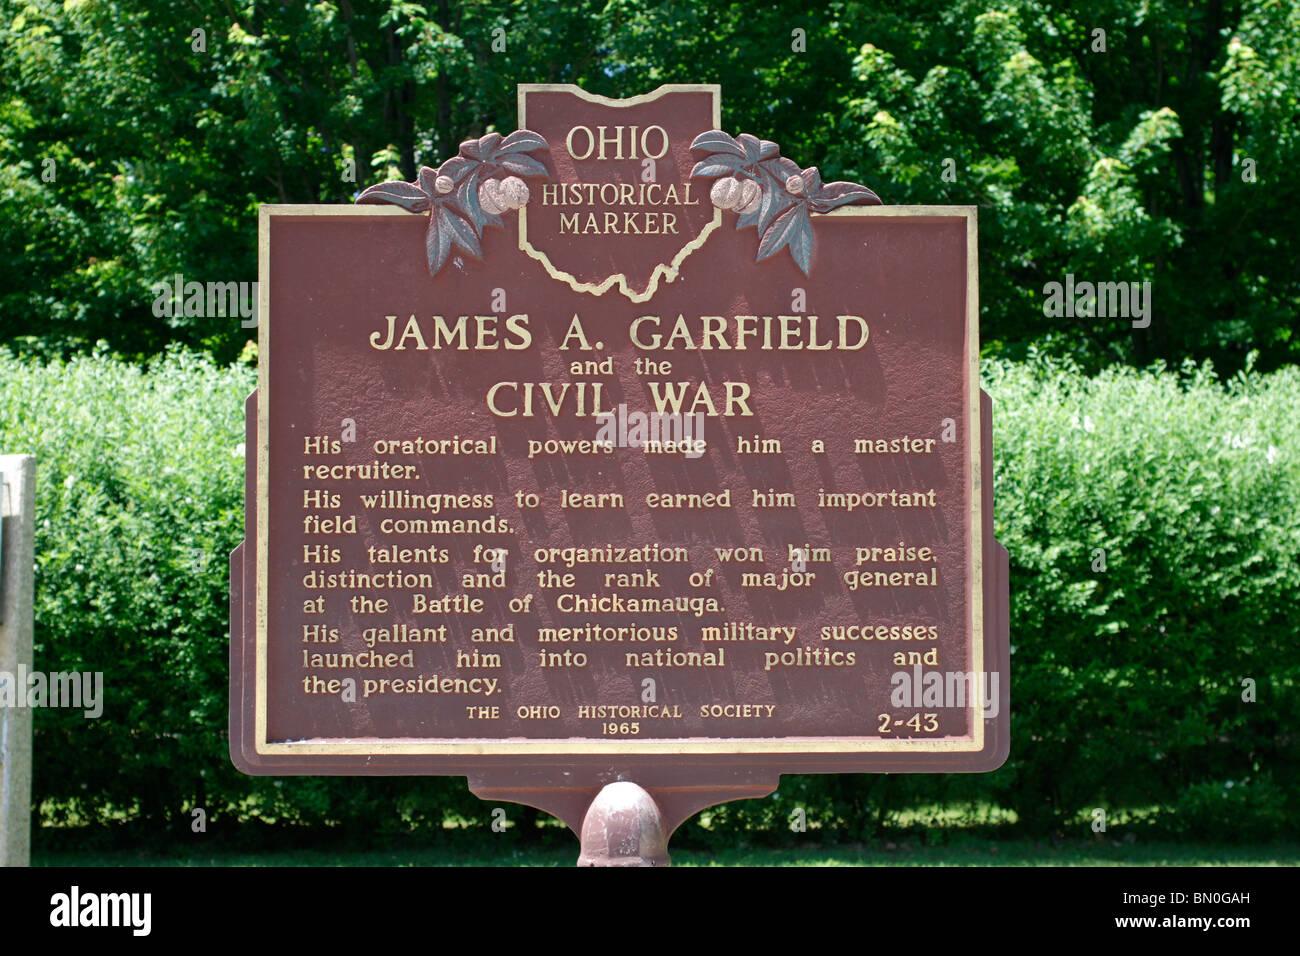 James A Garfield Monument Stock Photos Amp James A Garfield